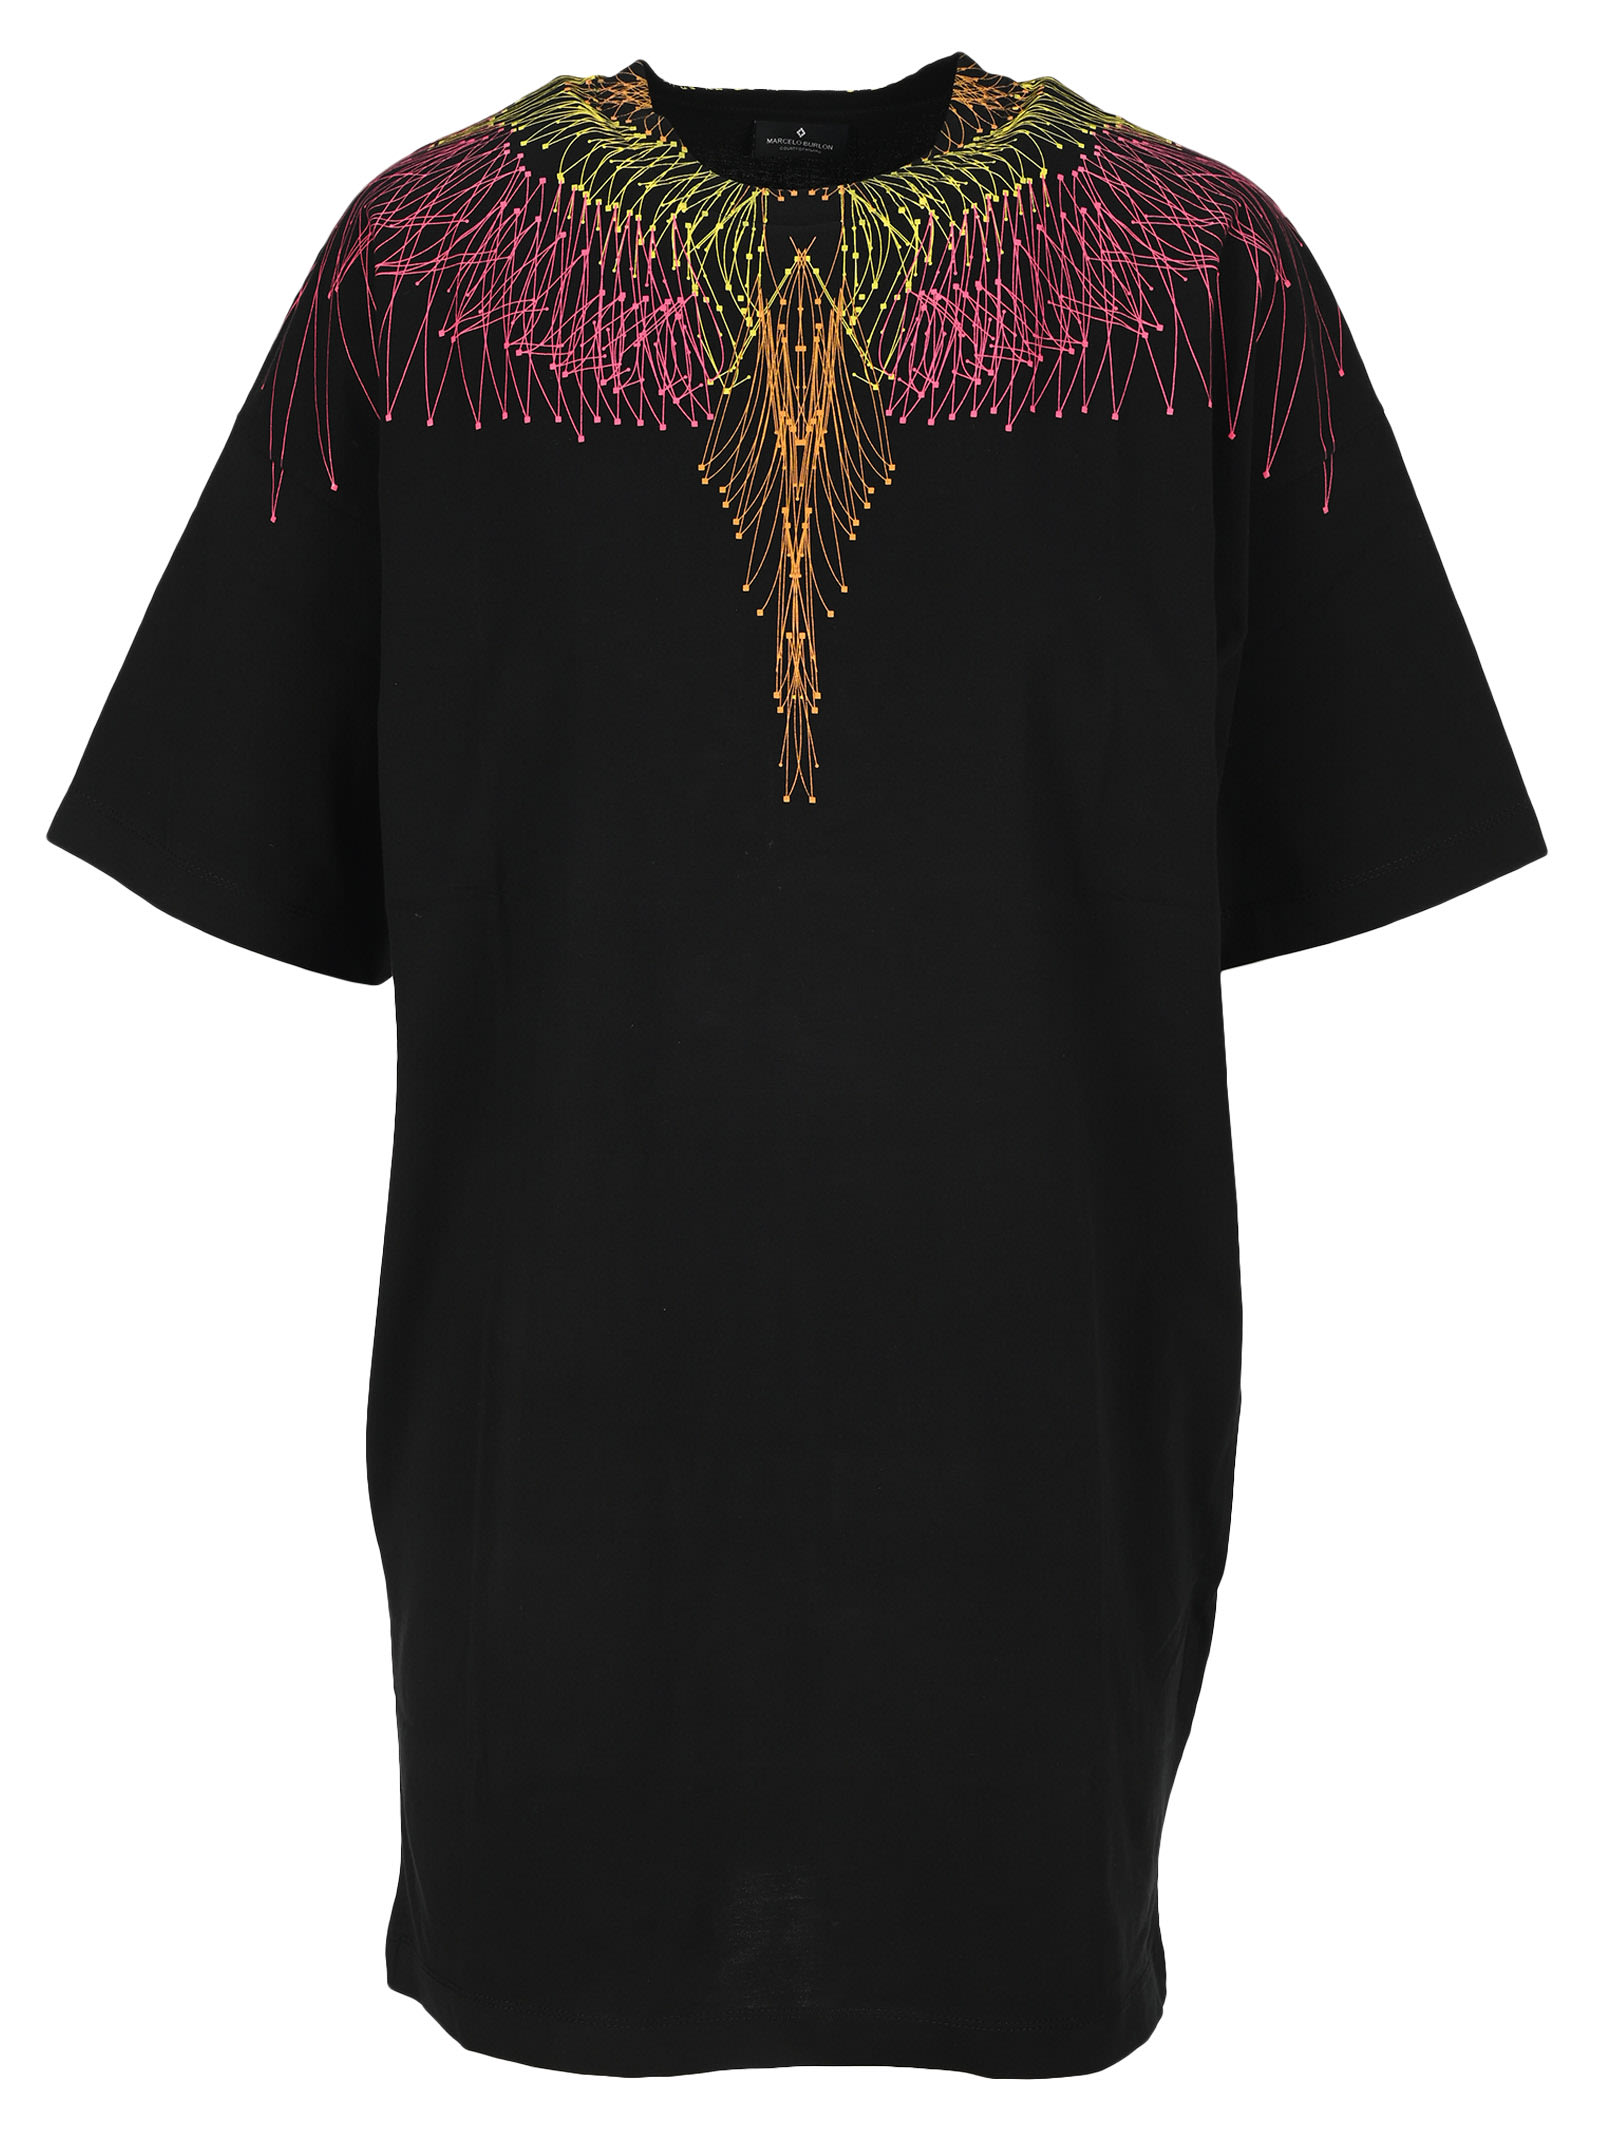 Buy Marcelo Burlon Maxi T-shirt Dress Wings online, shop Marcelo Burlon with free shipping